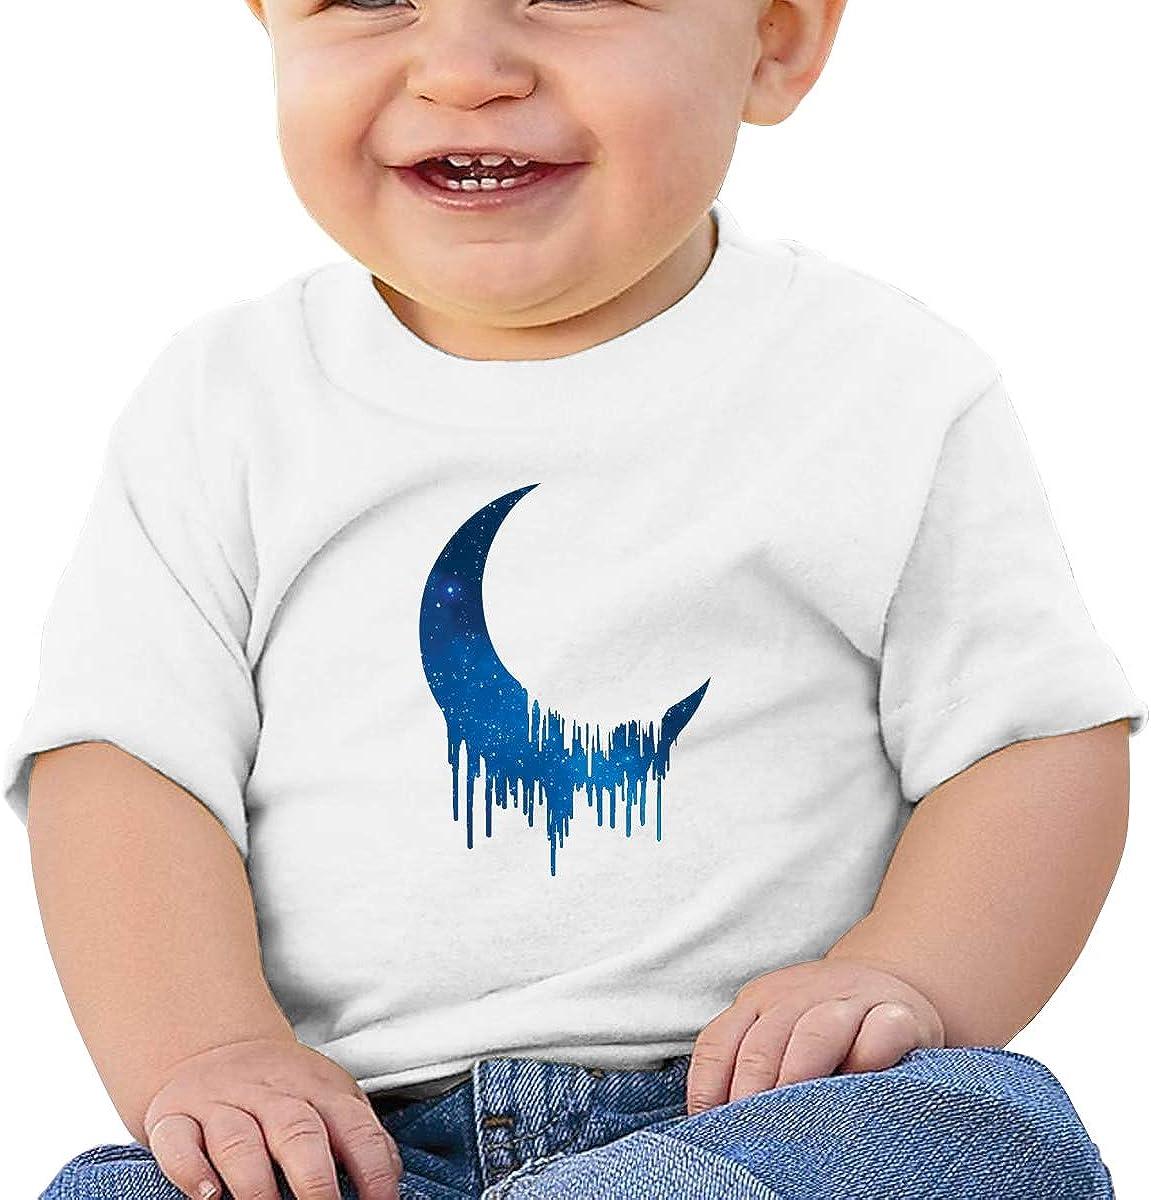 Kangtians Baby Galaxy Moon Dripping Melting Short Sleeve Shirt Toddler Tee